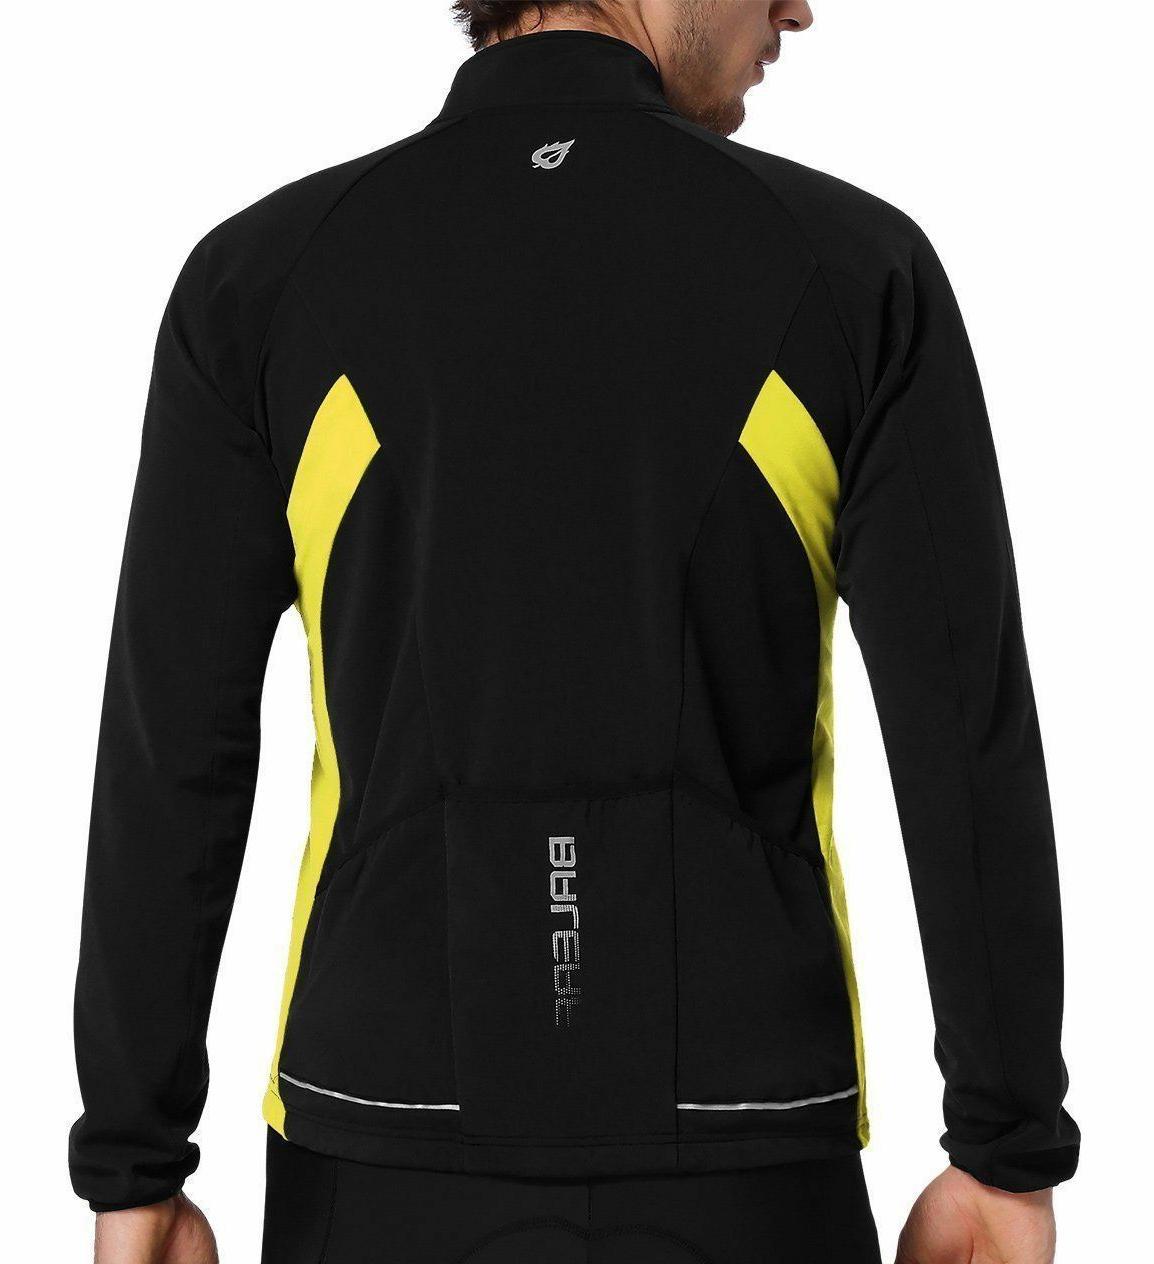 Baleaf Men's Full Long Sleeve Thermal Jersey Windproof M